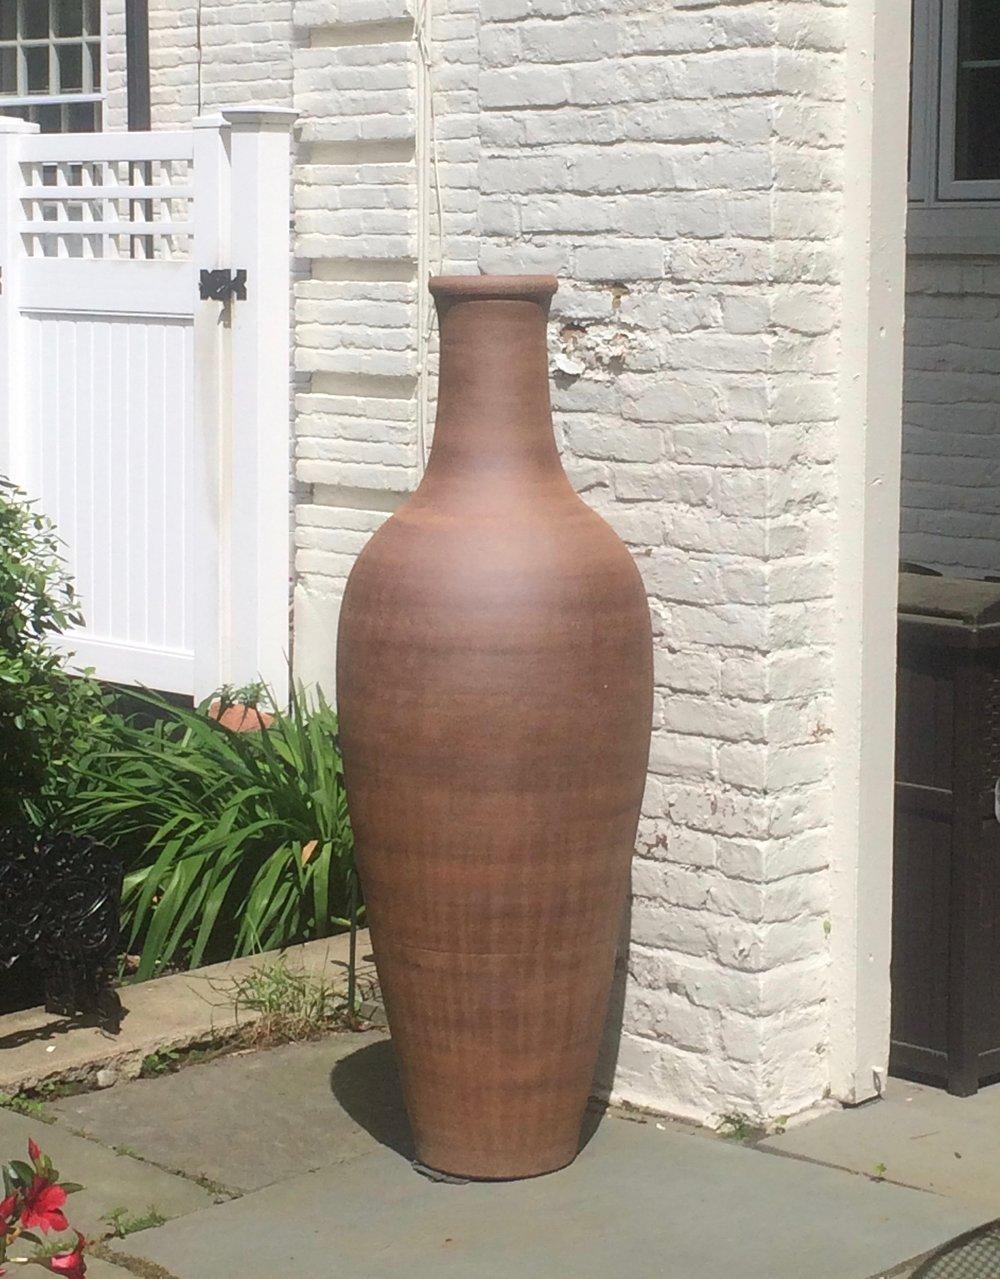 Classic bottle on patio